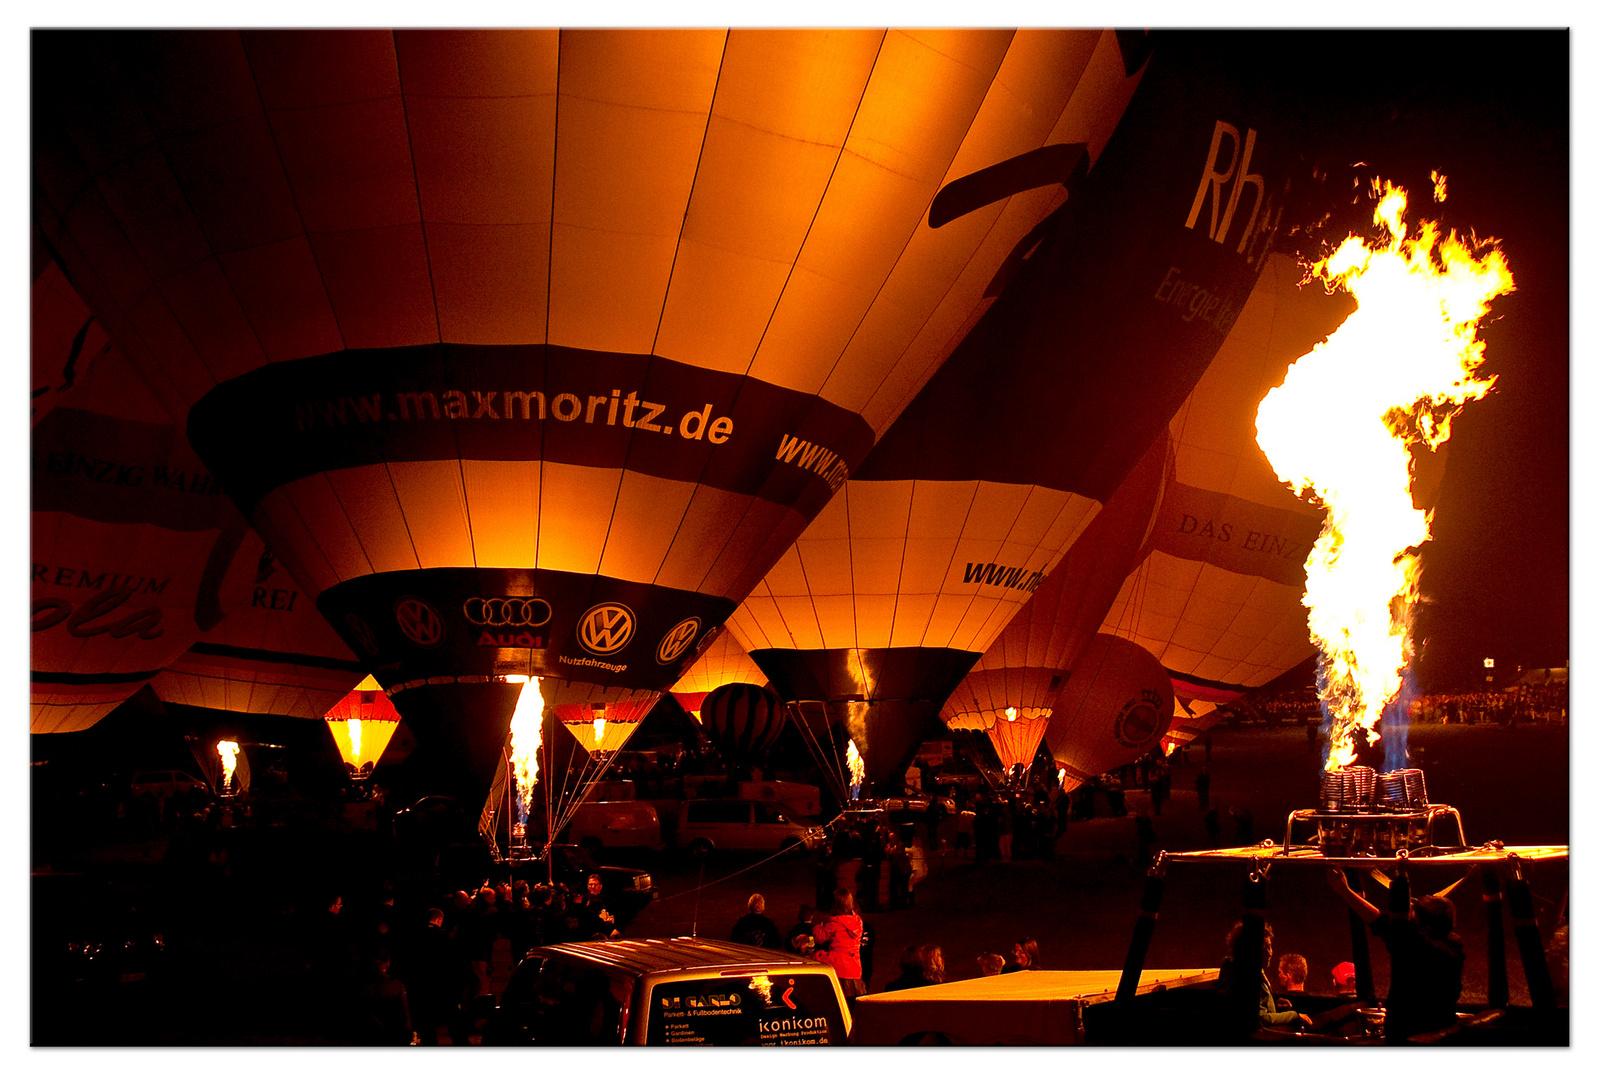 Montgolfiade 2010 / night-glow